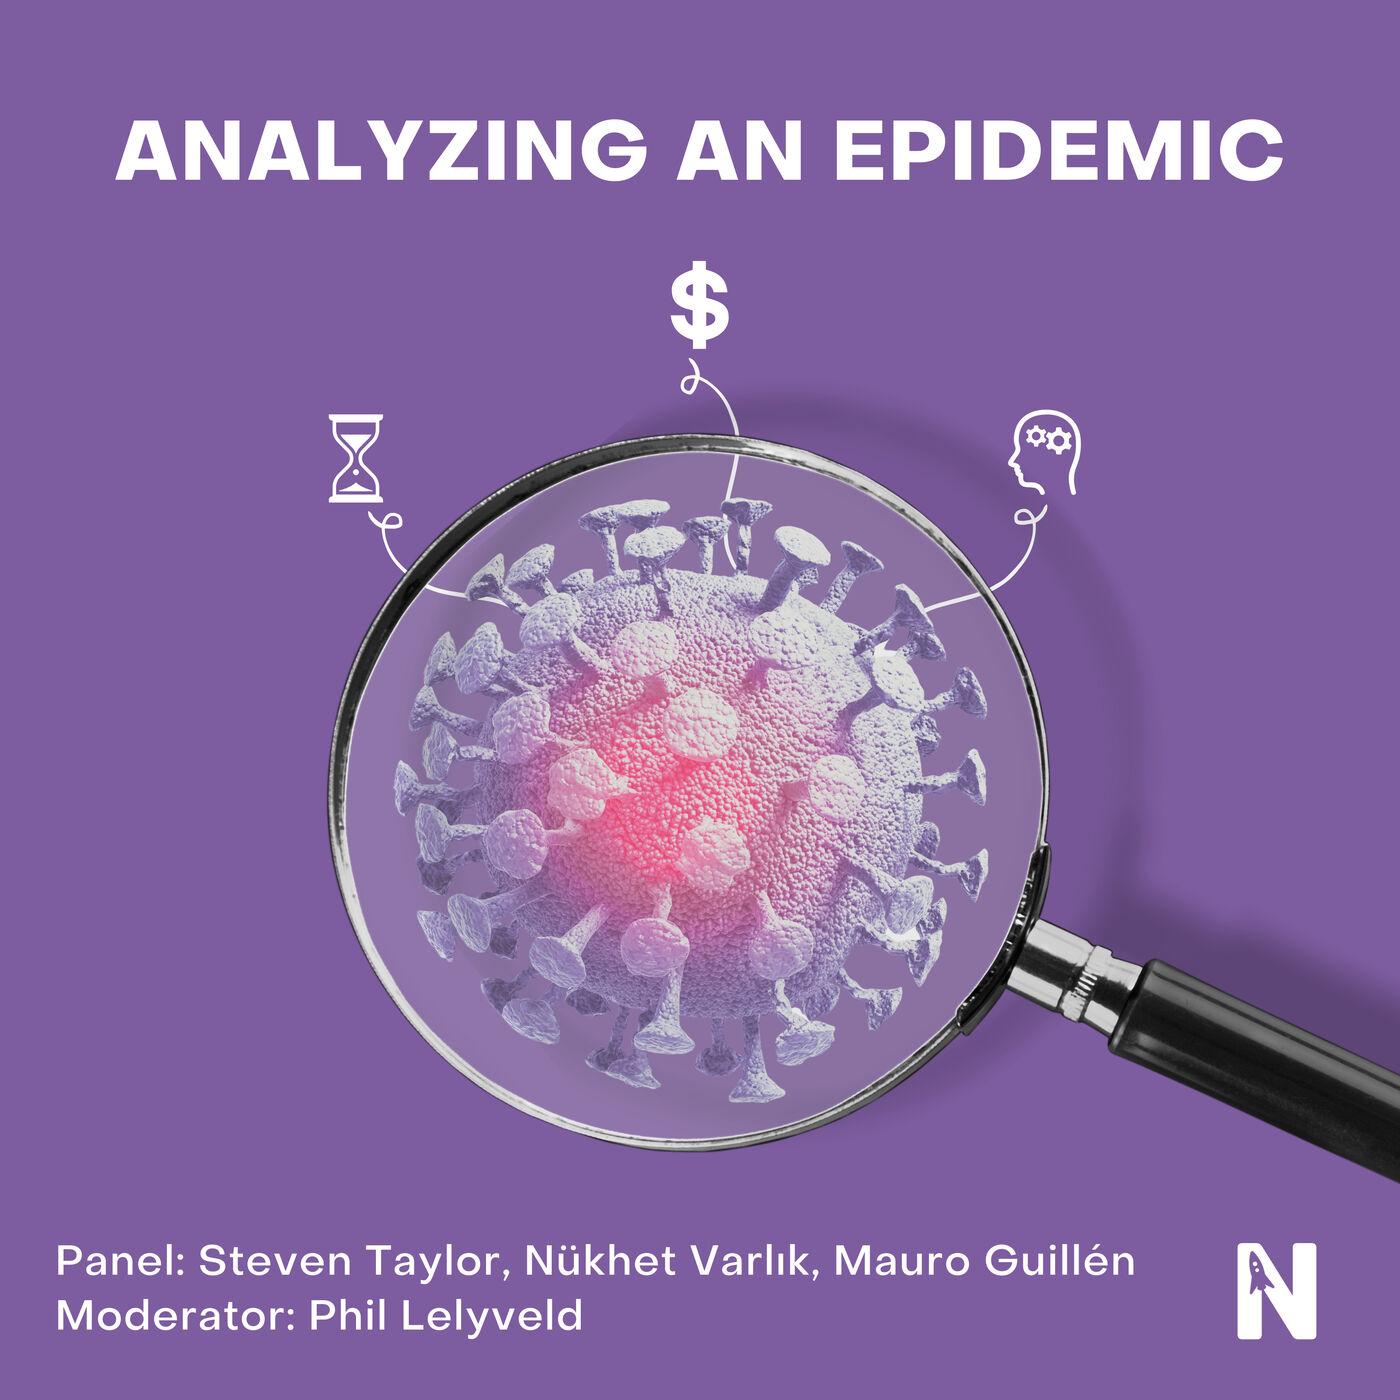 Analyzing an Epidemic   Steven Taylor, Nükhet Varlık, Mauro Guillén, Phil Lelyveld